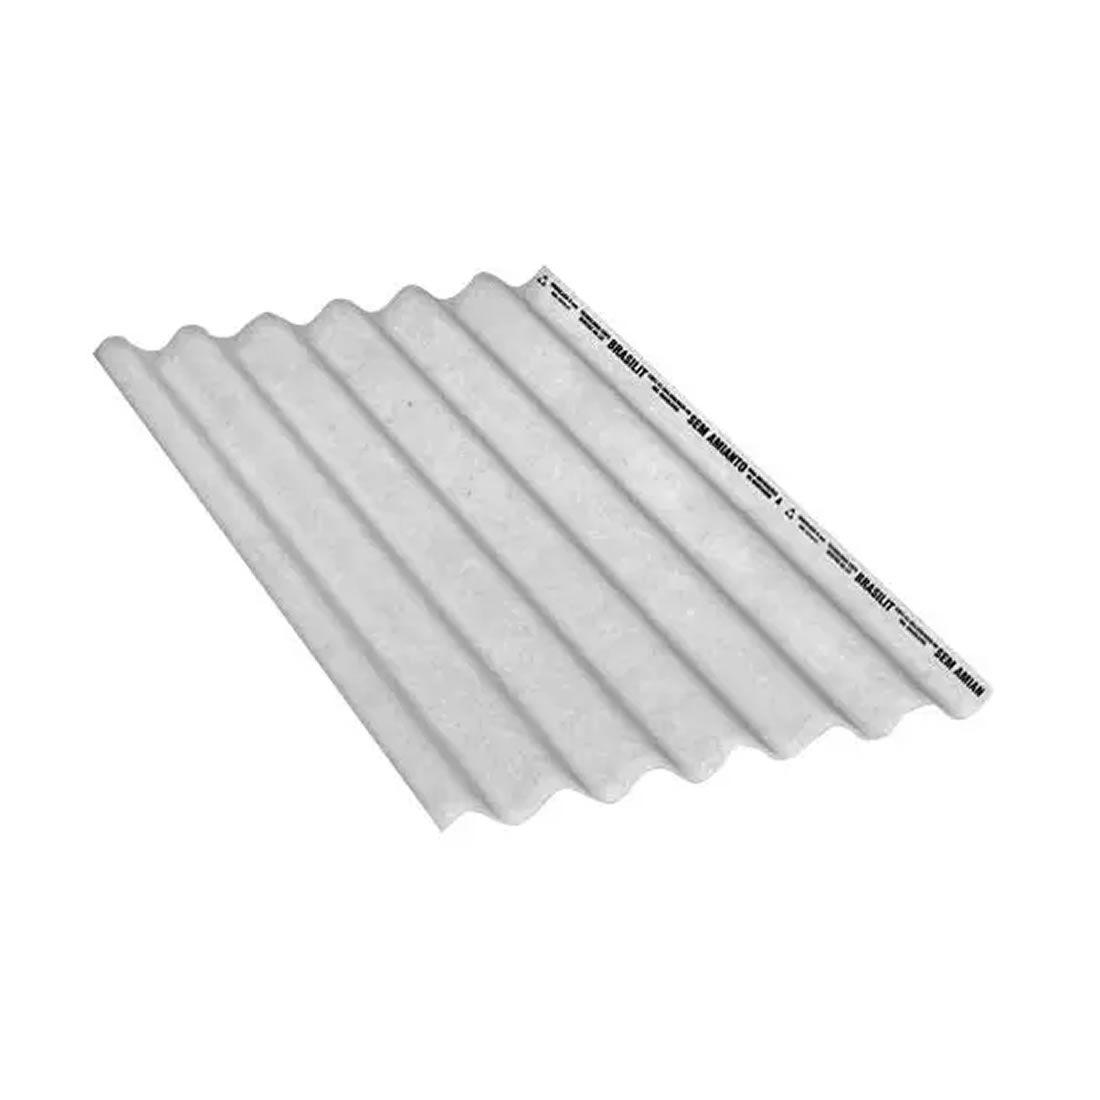 Telha de Fibrocimento Ondulada CRFS Cinza 1,83x1,10mx5mm Brasilit